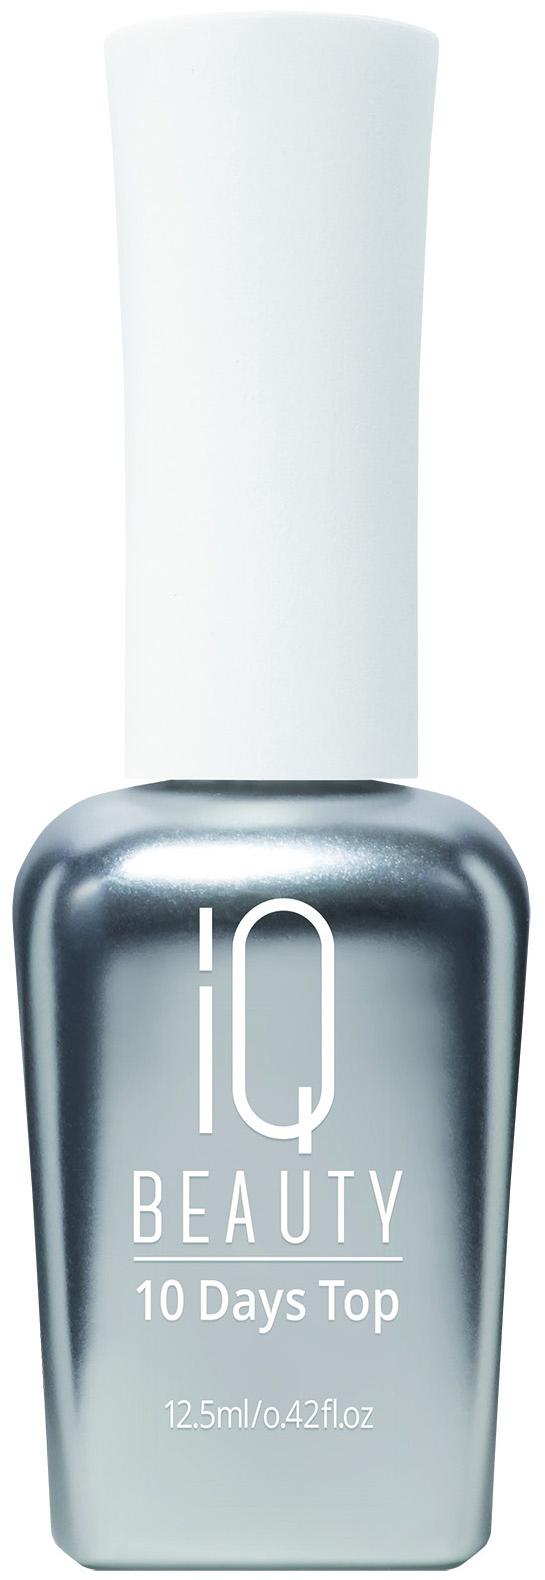 Закрепитель лака для ногтей IQ Beauty